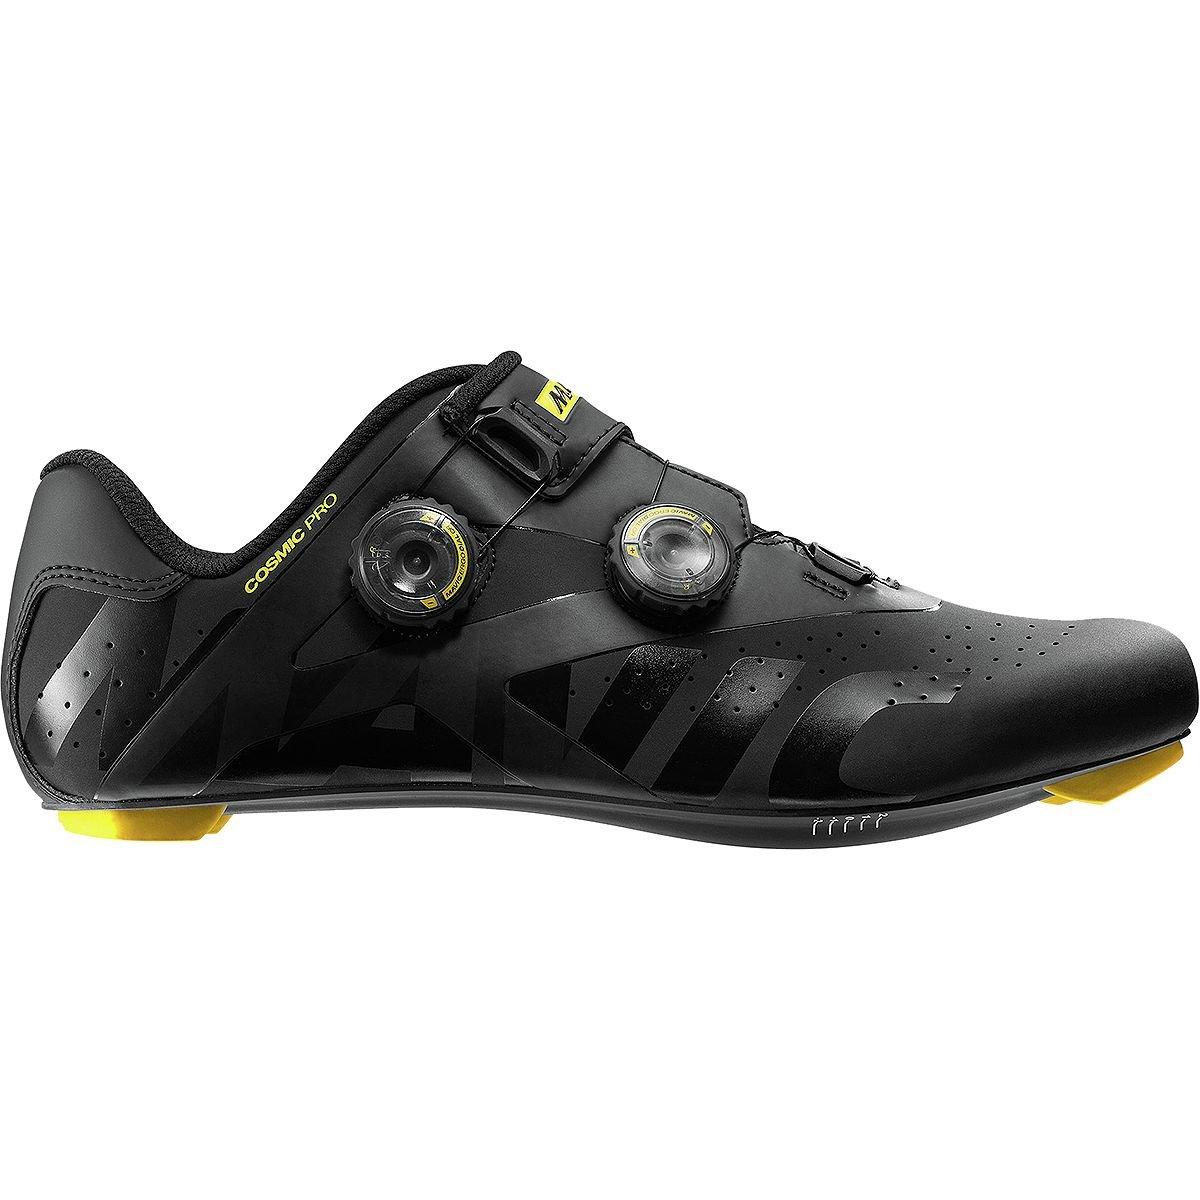 Mavic Cosmic Pro Pro Pro Rennrad Fahrrad Schuhe schwarz gelb 2019 72ffed